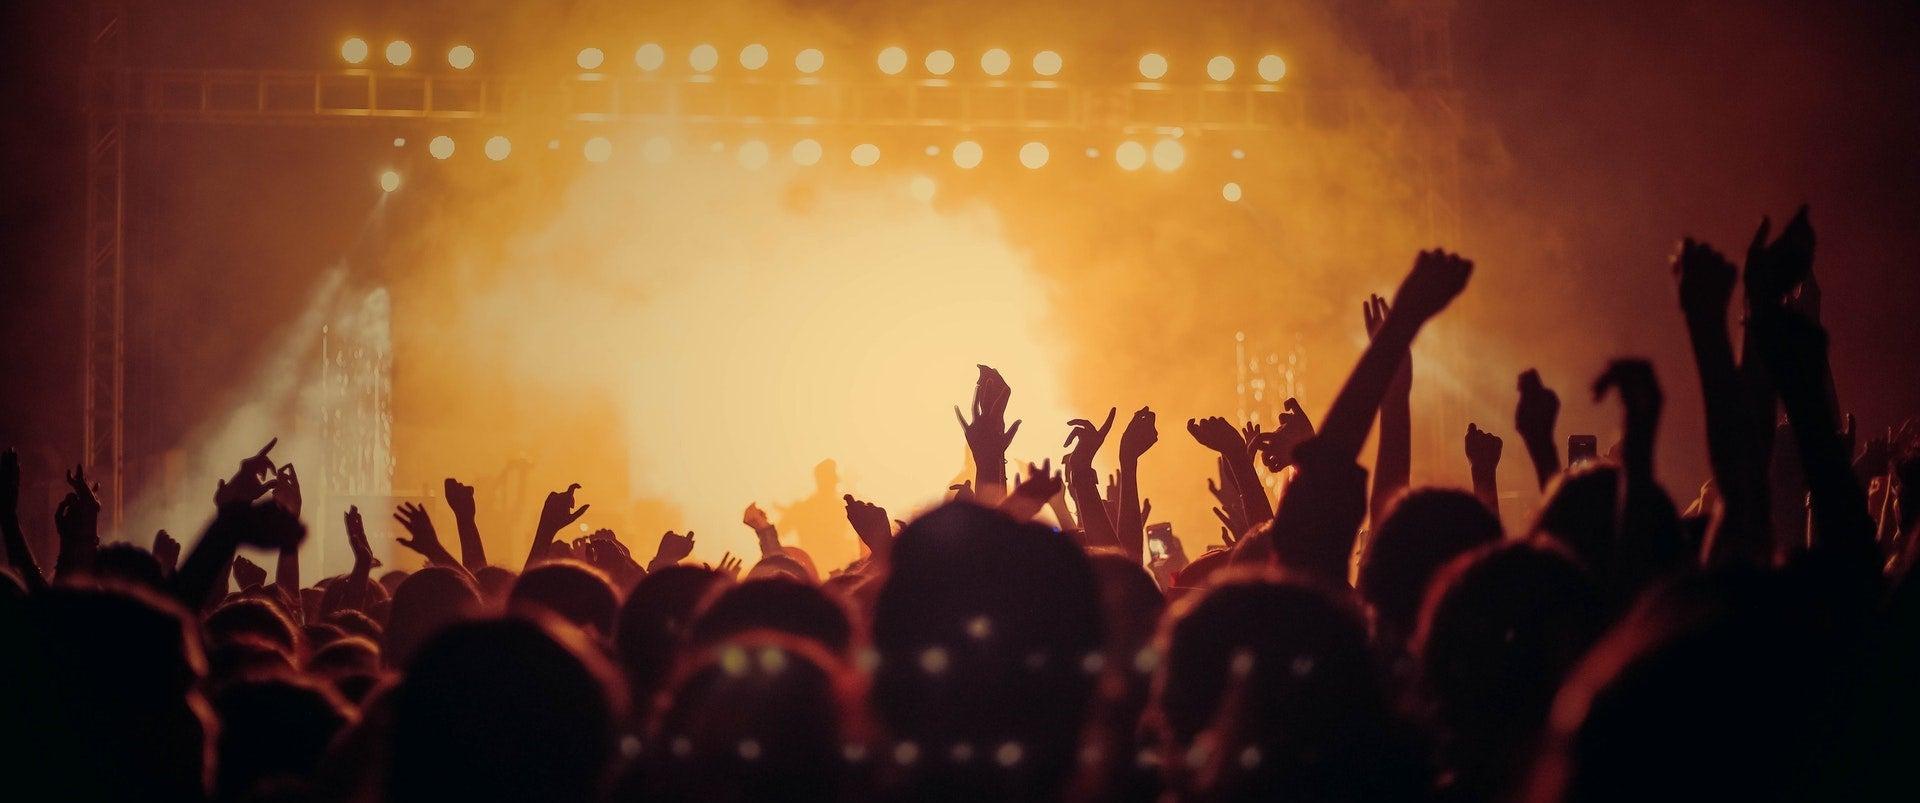 Apple Music vs. Spotify: Concert